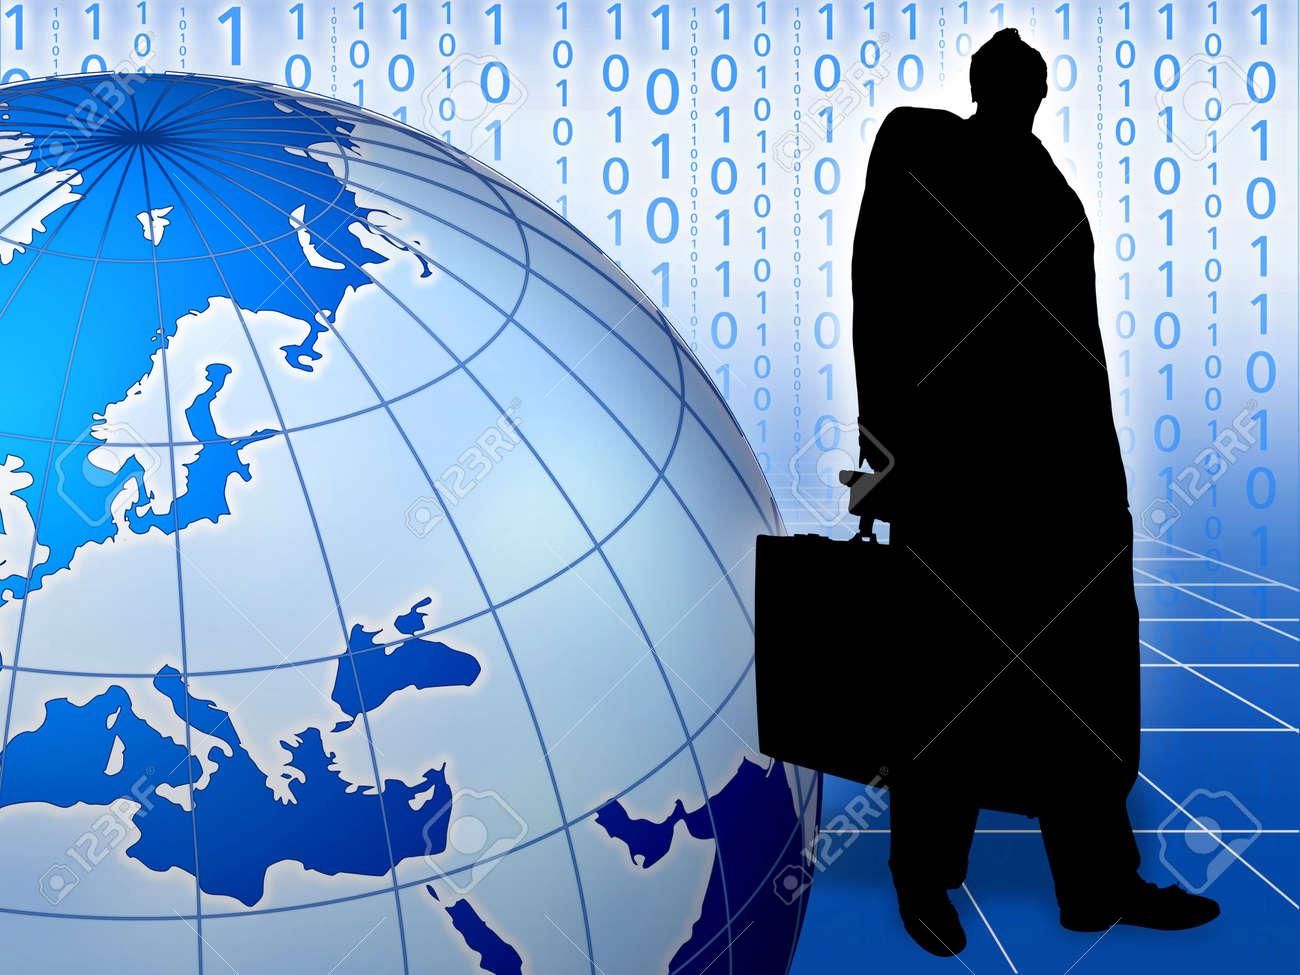 Conceptual image depicting world trade Big boss. World business. Stock Photo - 2954339